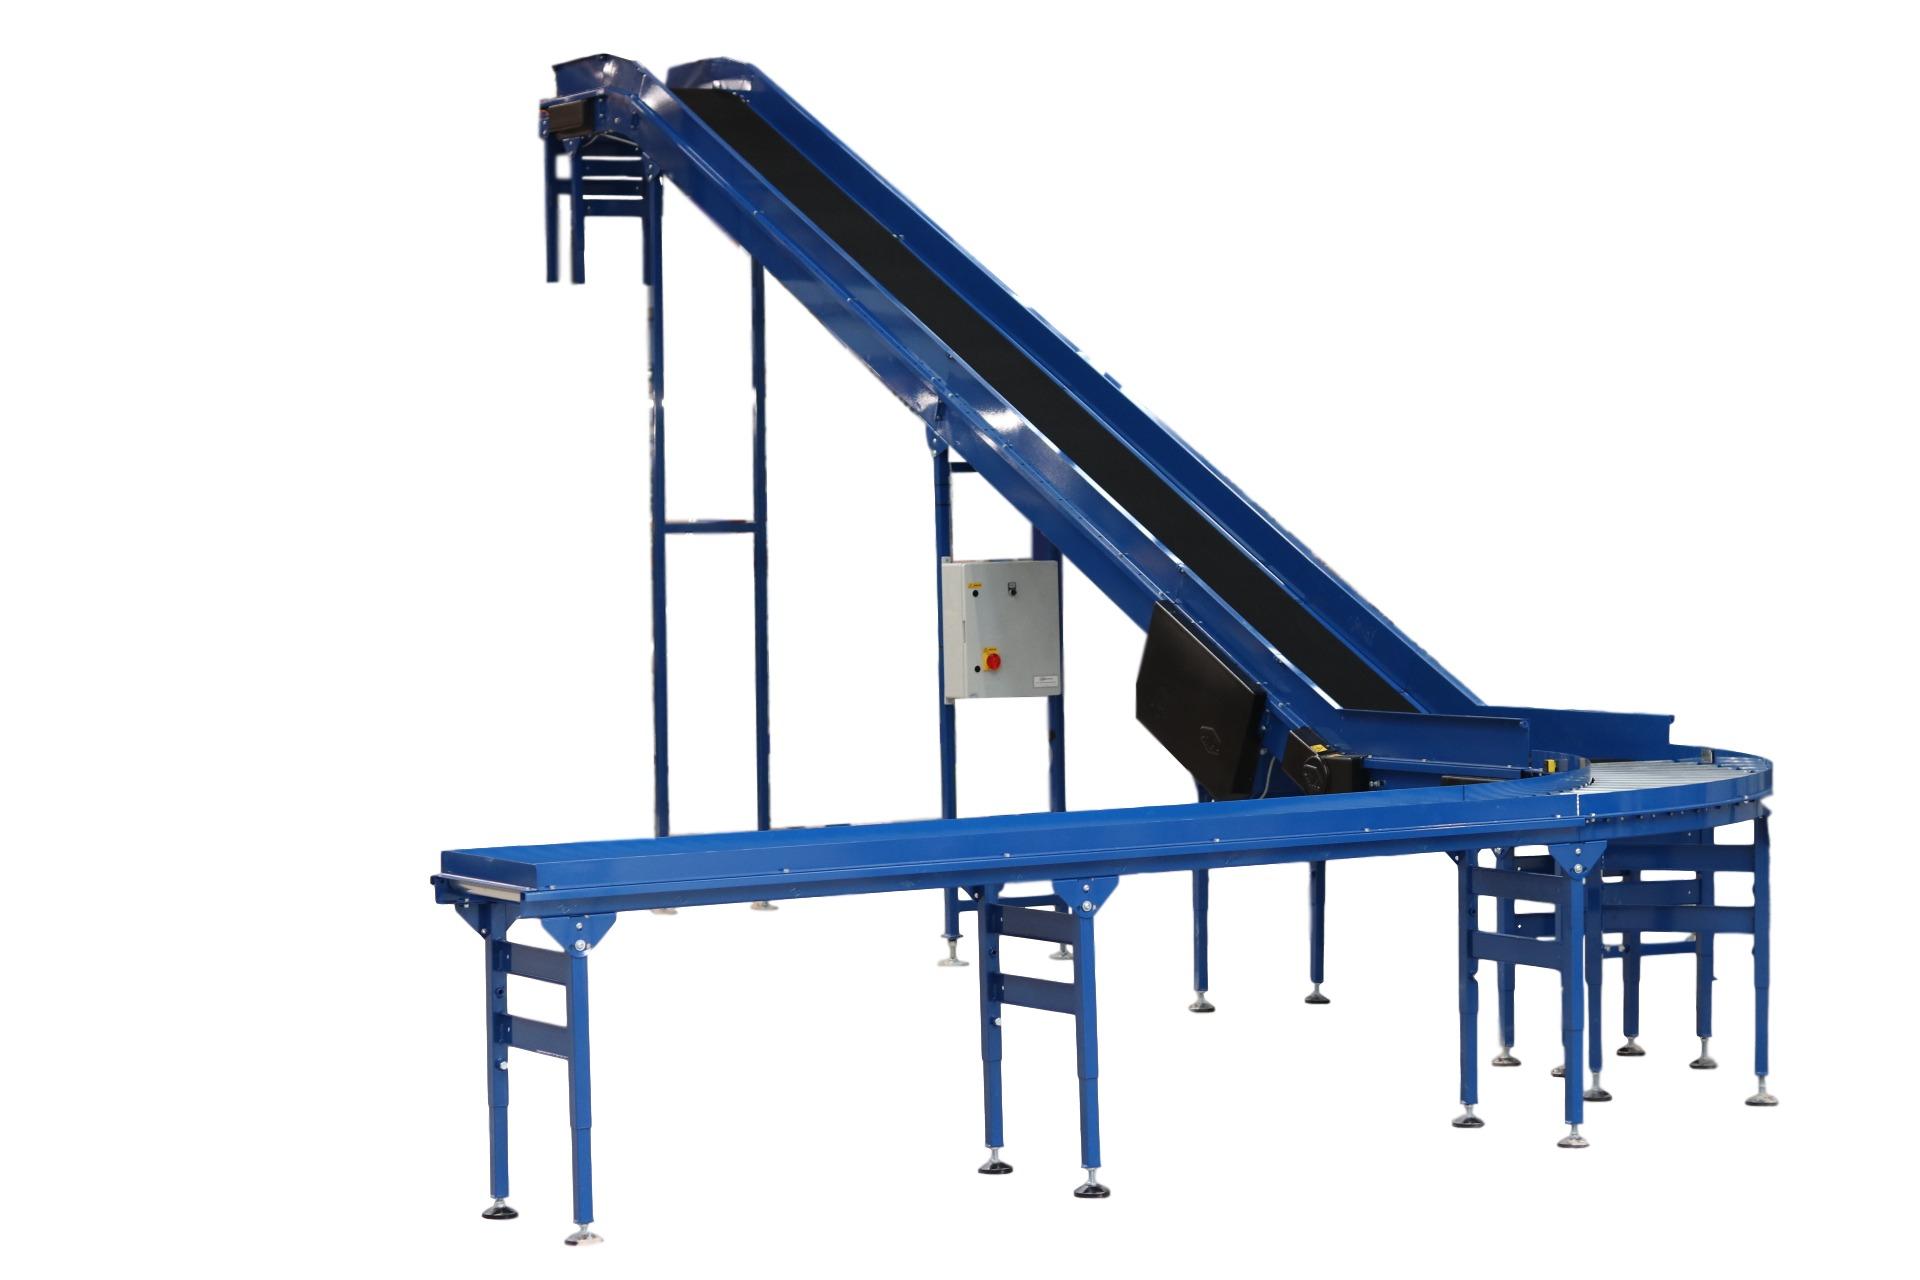 mezzanine-floor-conveyor-systems-incline-floor-belt-conveyor-floor-to-floor-conveyor-systems